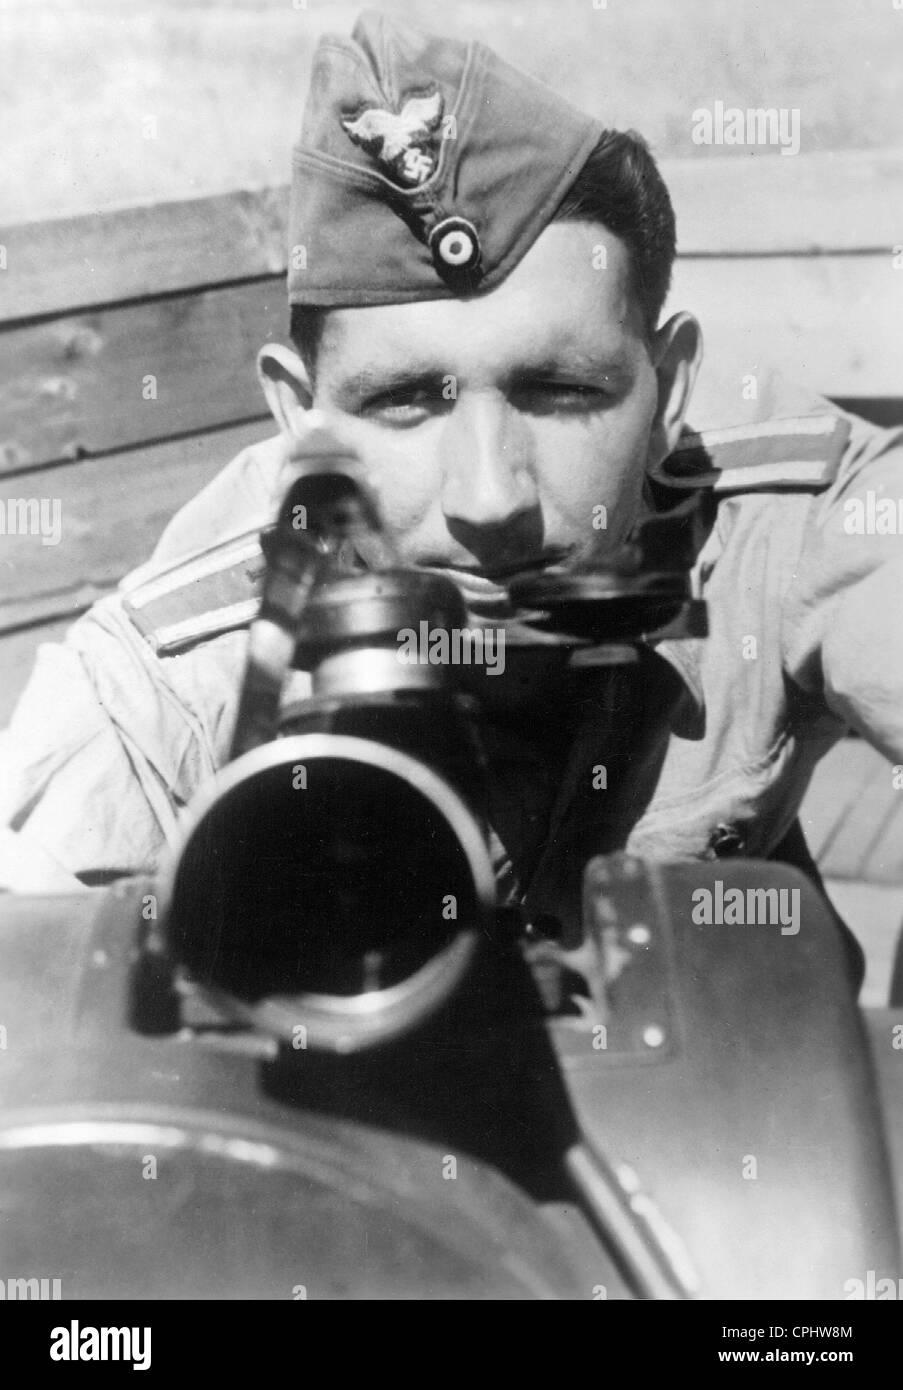 German Flak soldier at a rangefinder, 1942 - Stock Image